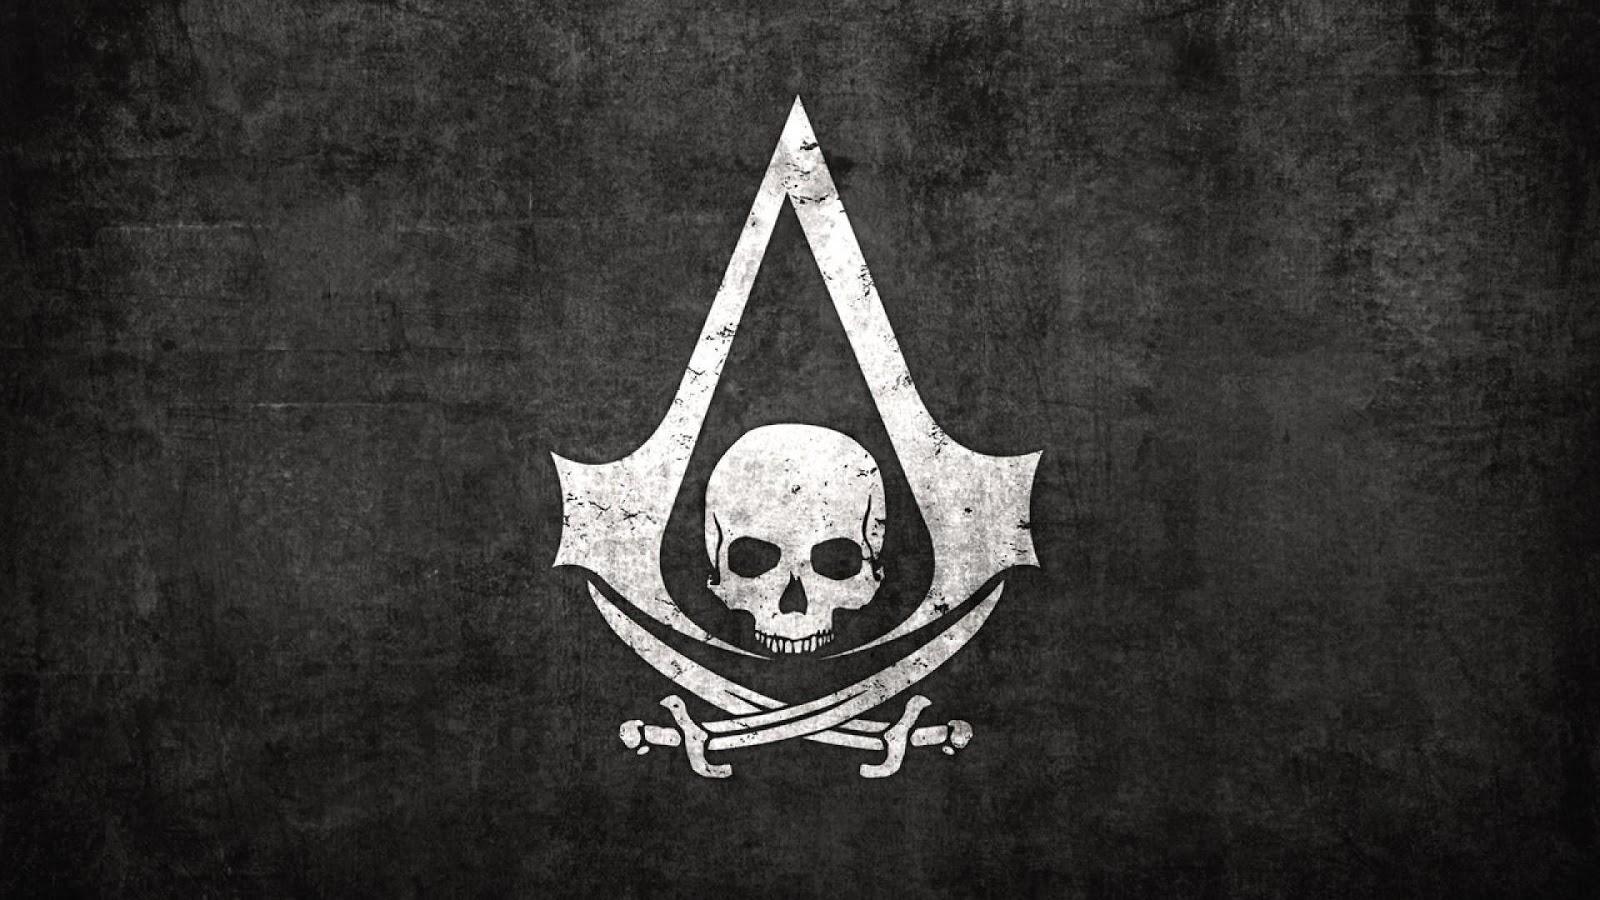 Assassins Creed Unity Logo Wallpapers Image Gallery DirDoo